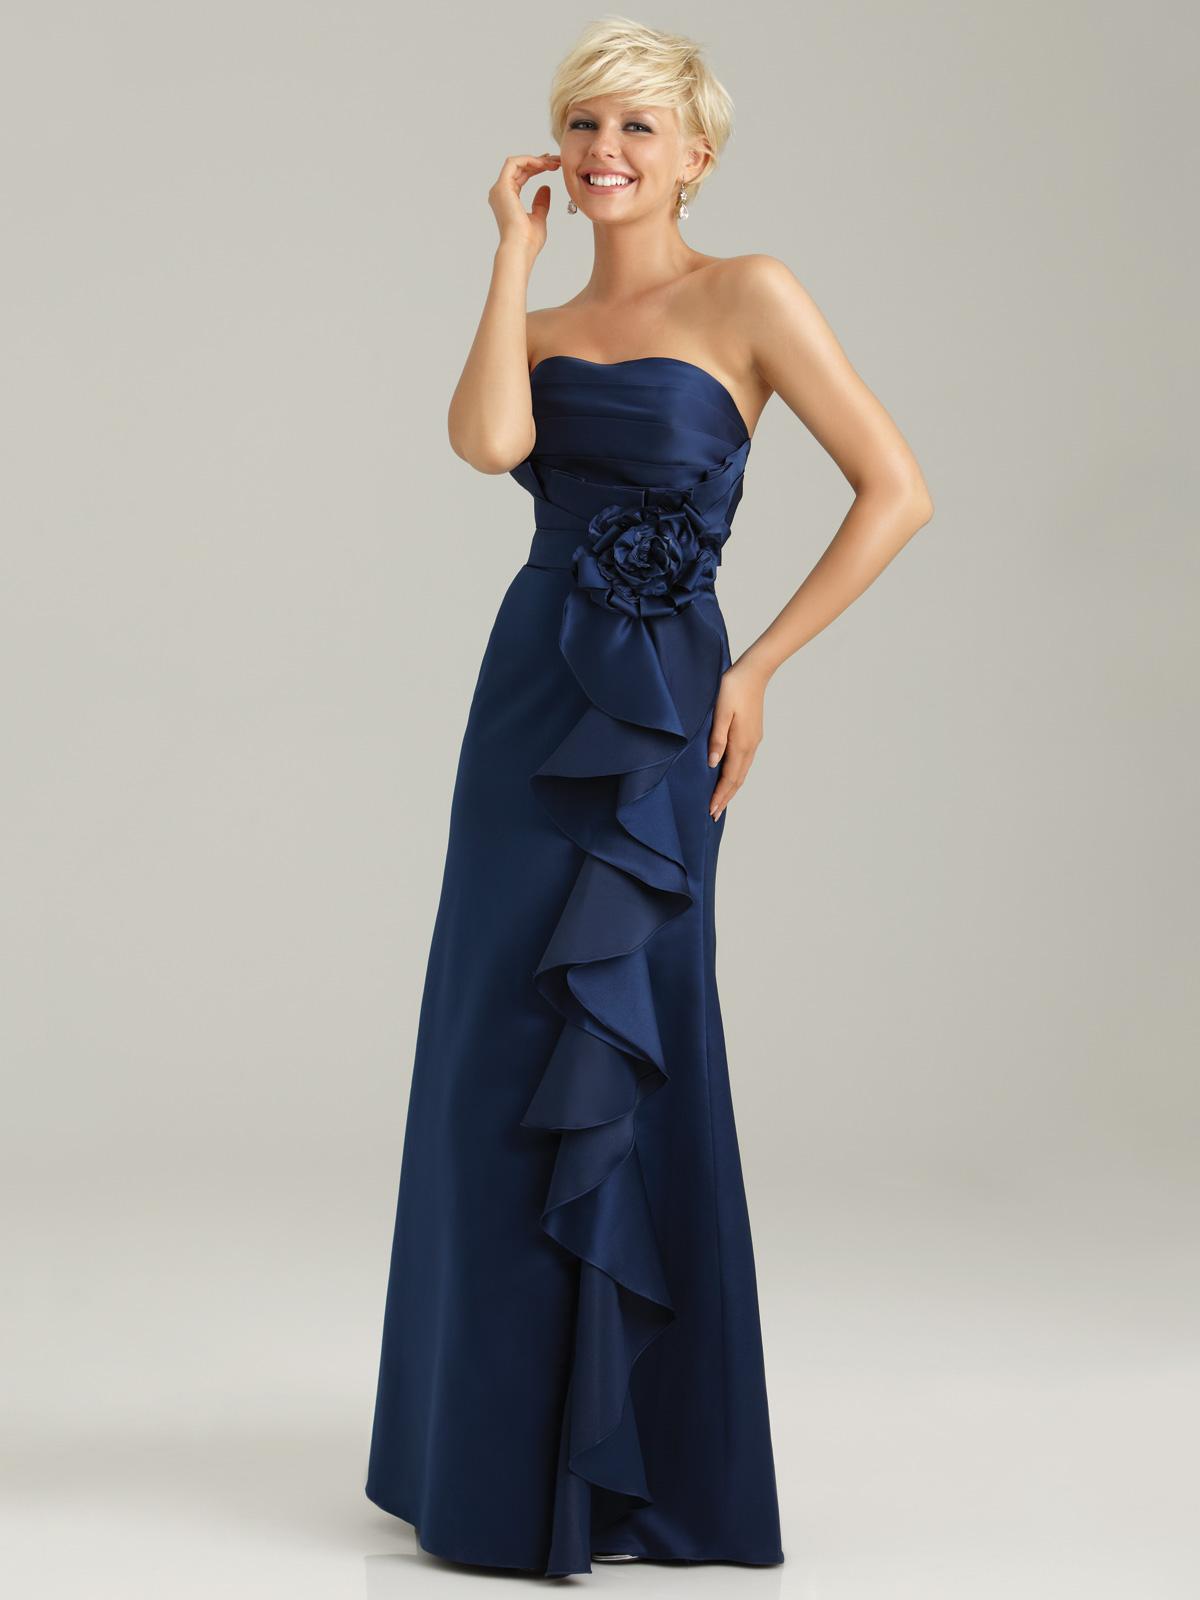 Strapless navy blue bridesmaid dress strapless navy blue bridesmaid dress ombrellifo Image collections